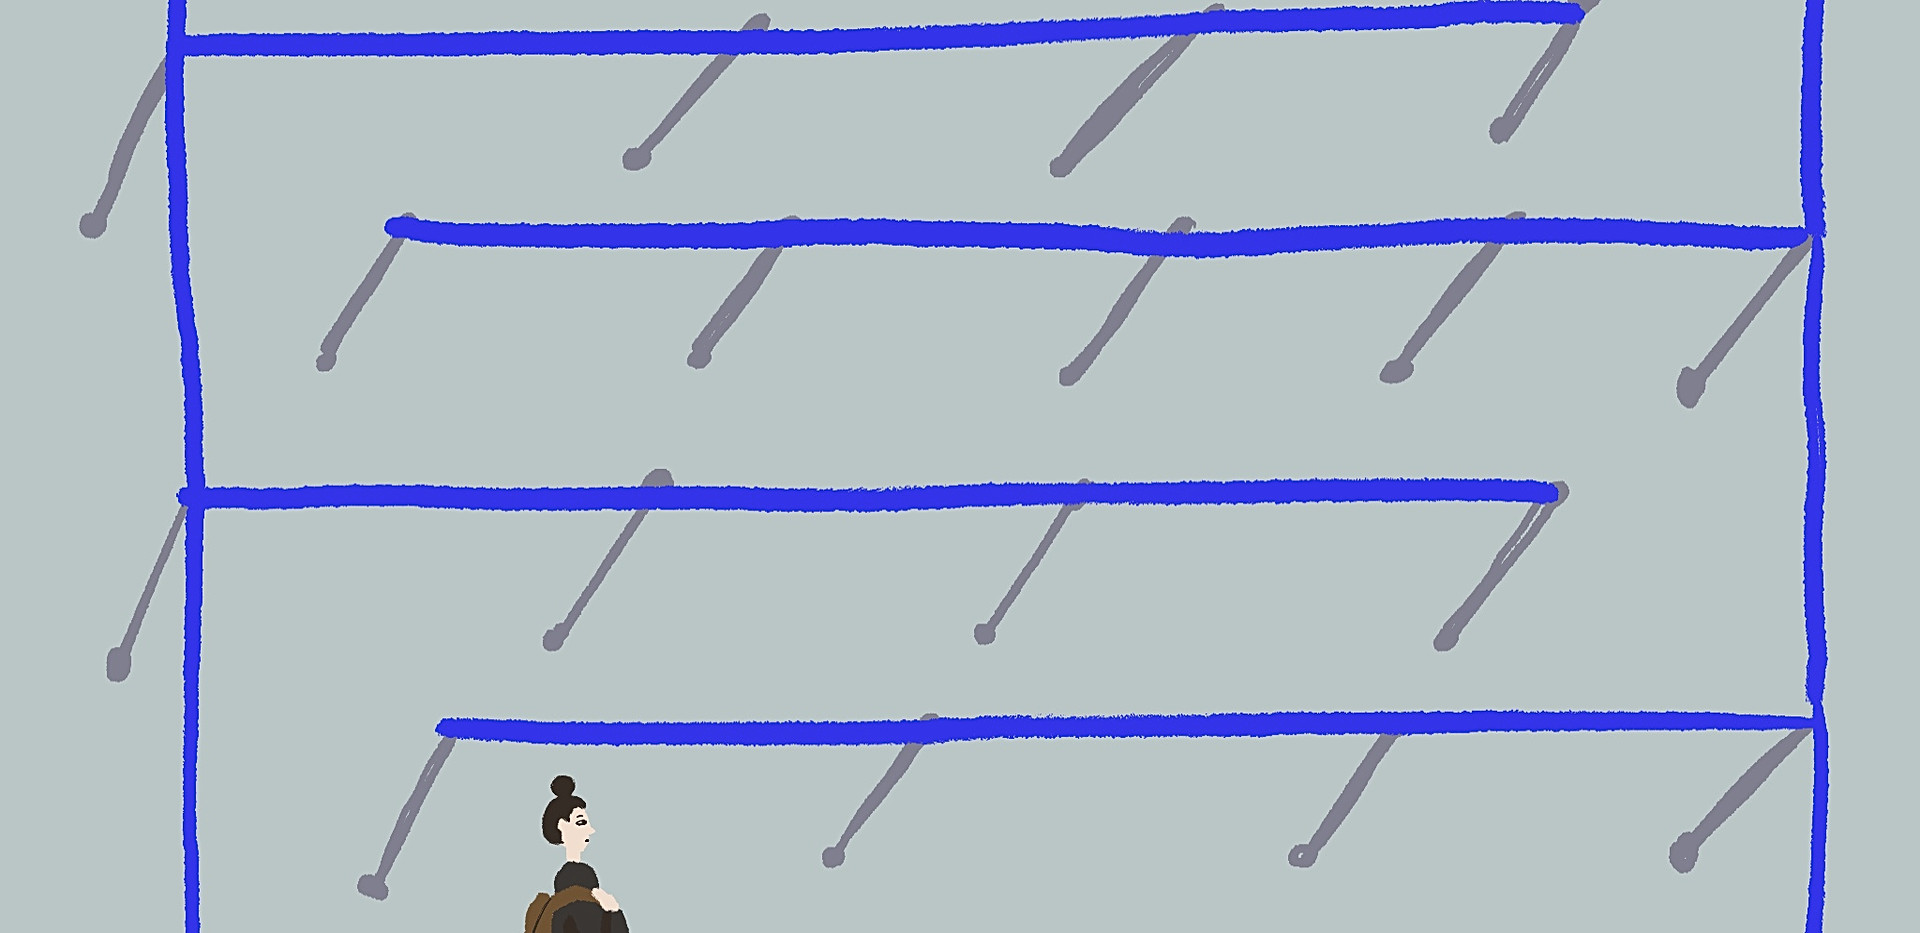 Awkward airport maze